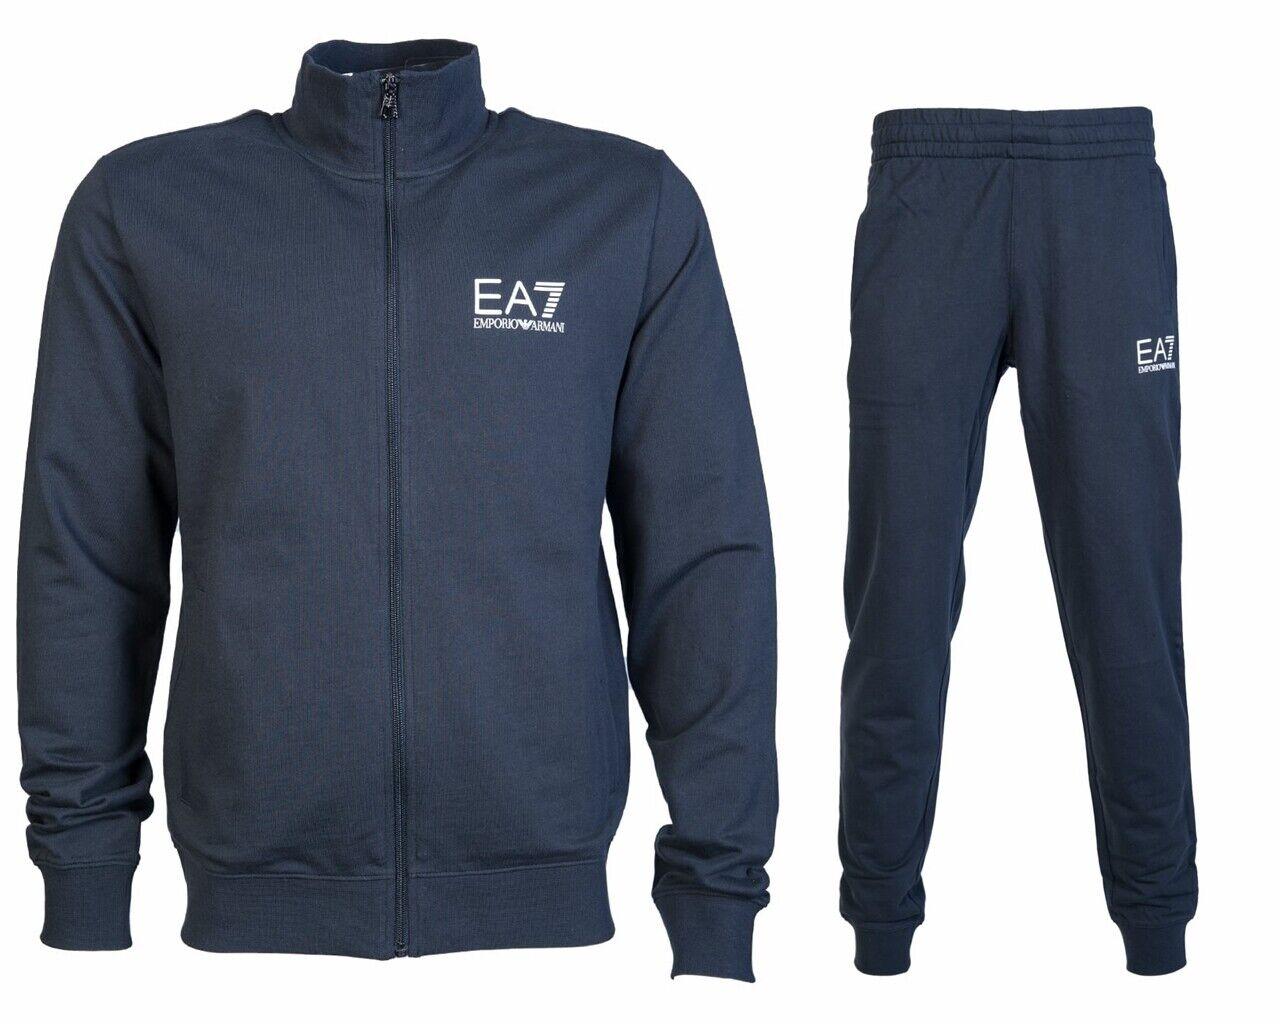 Emporio Armani 3gpv51 Pj05z Herren Ea7 Trainingsanzug Nachtblau Jogginganzug